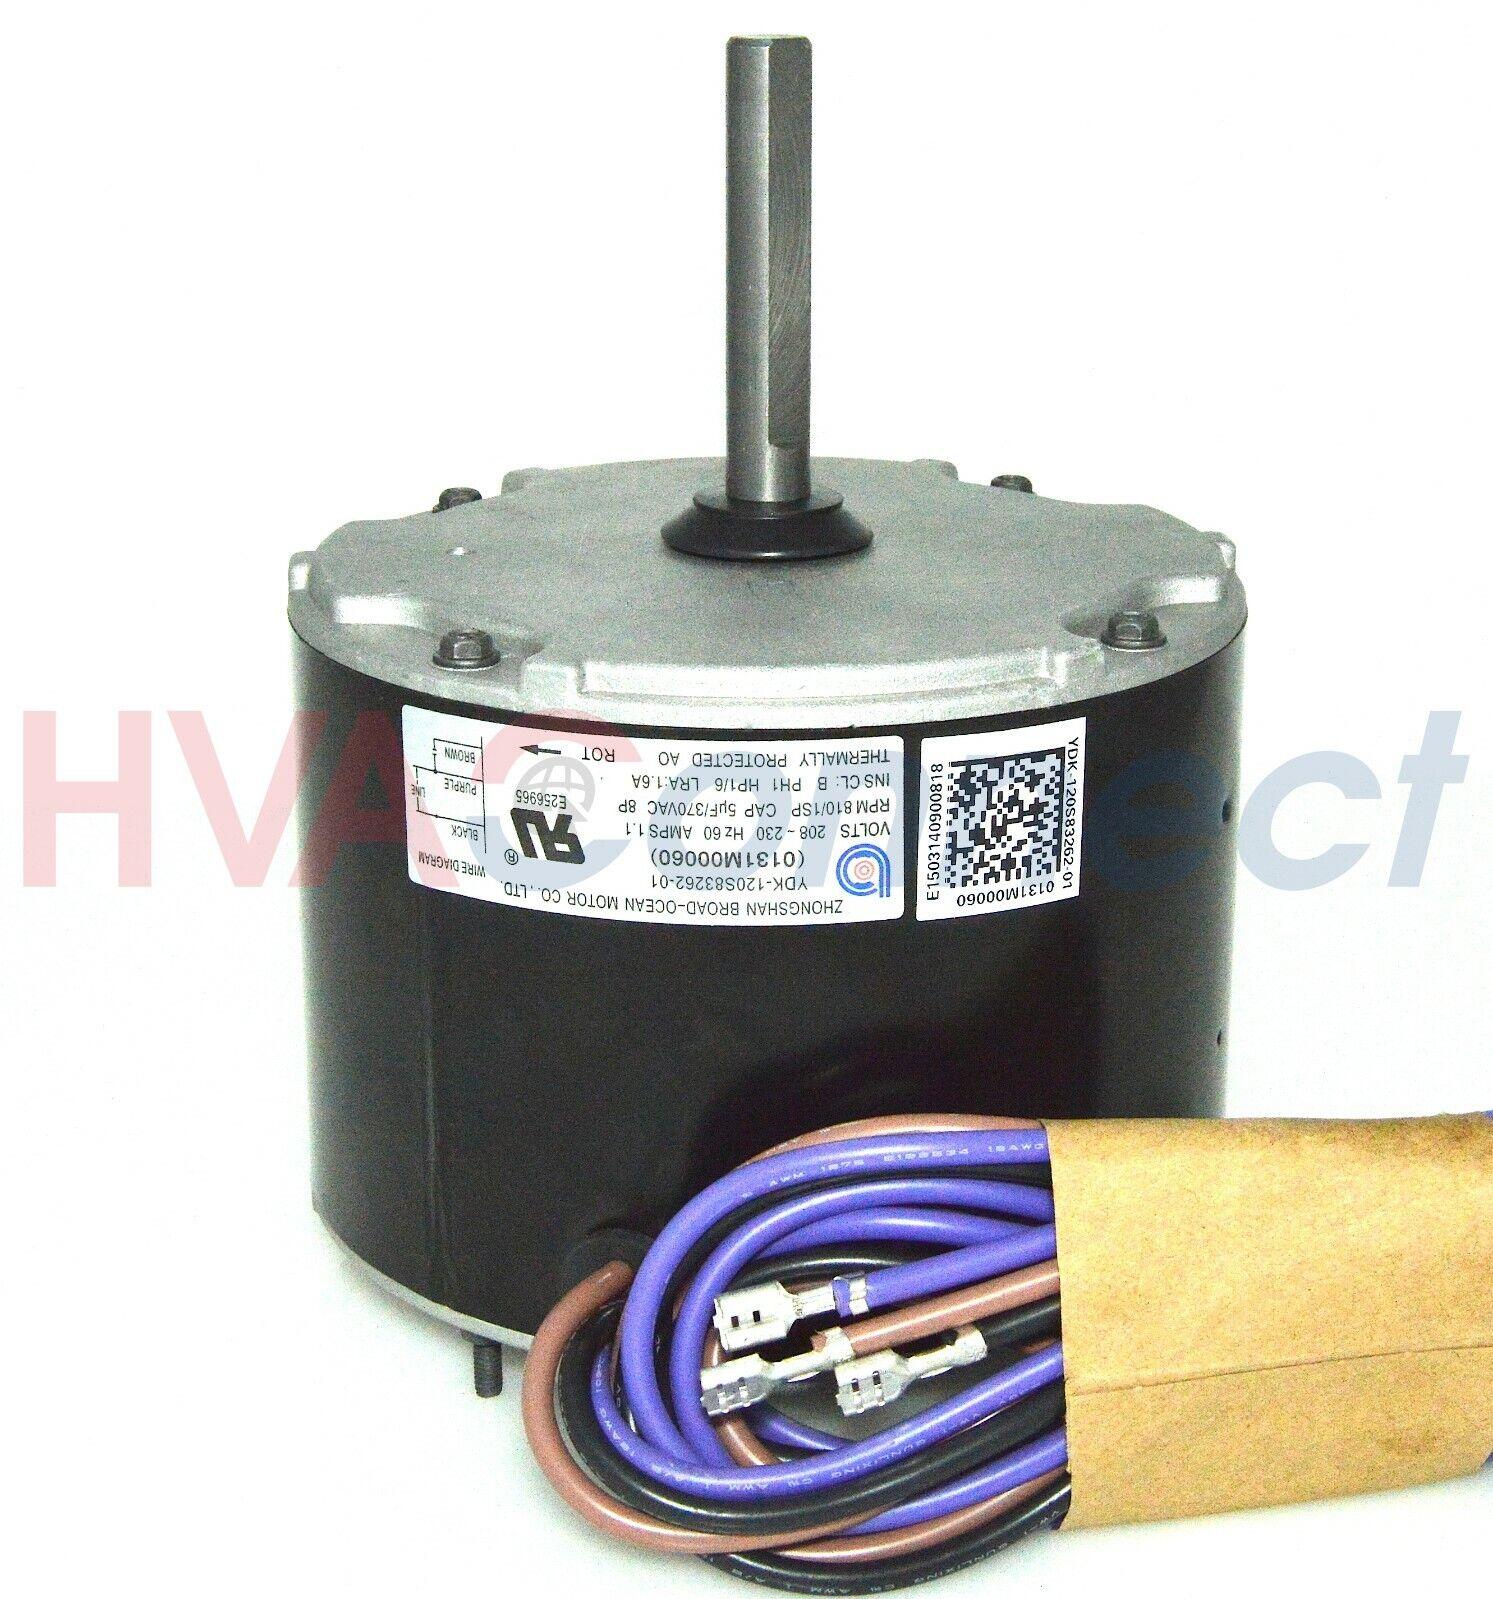 hight resolution of goodman janitrol fan motor 1 6 0131m0060s 0131m00060 for sale online fan motor in addition goodman 5 ton condenser also heil furnace wiring